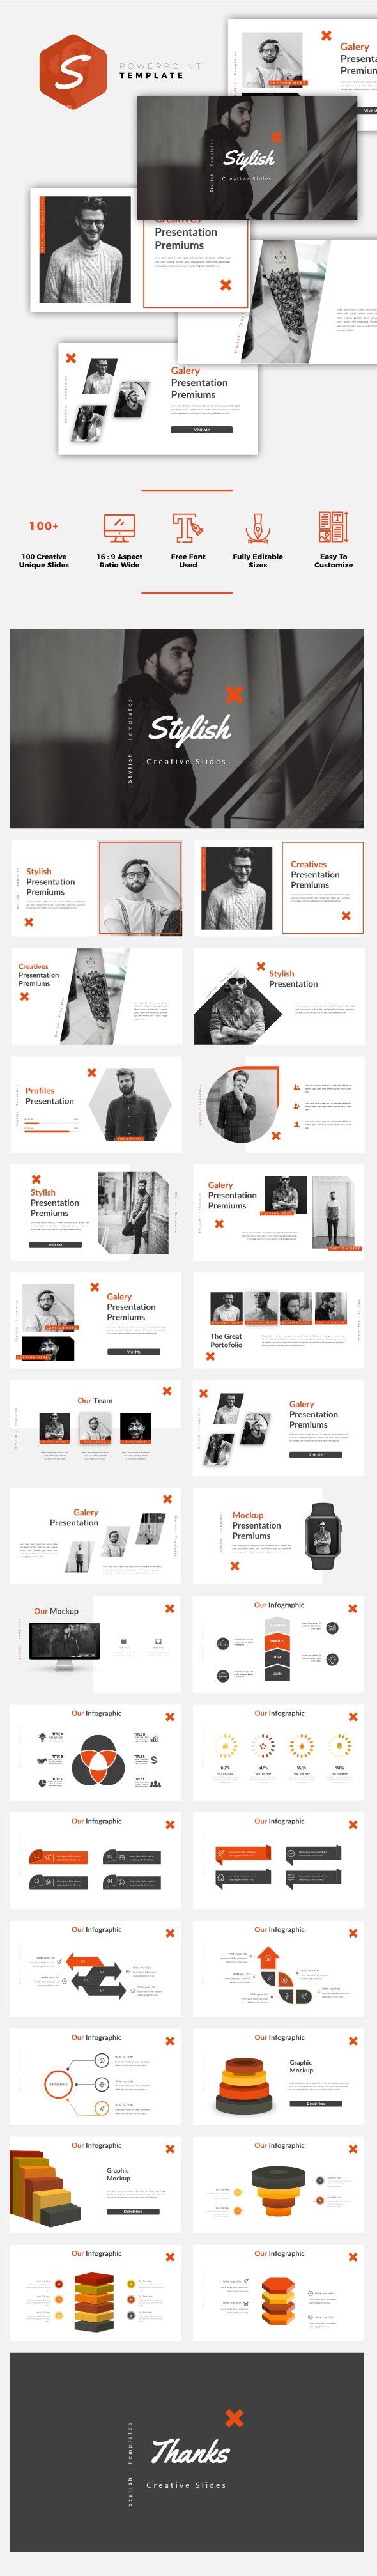 Stylish - Creative PowerPoint Template - Creative PowerPoint Templates